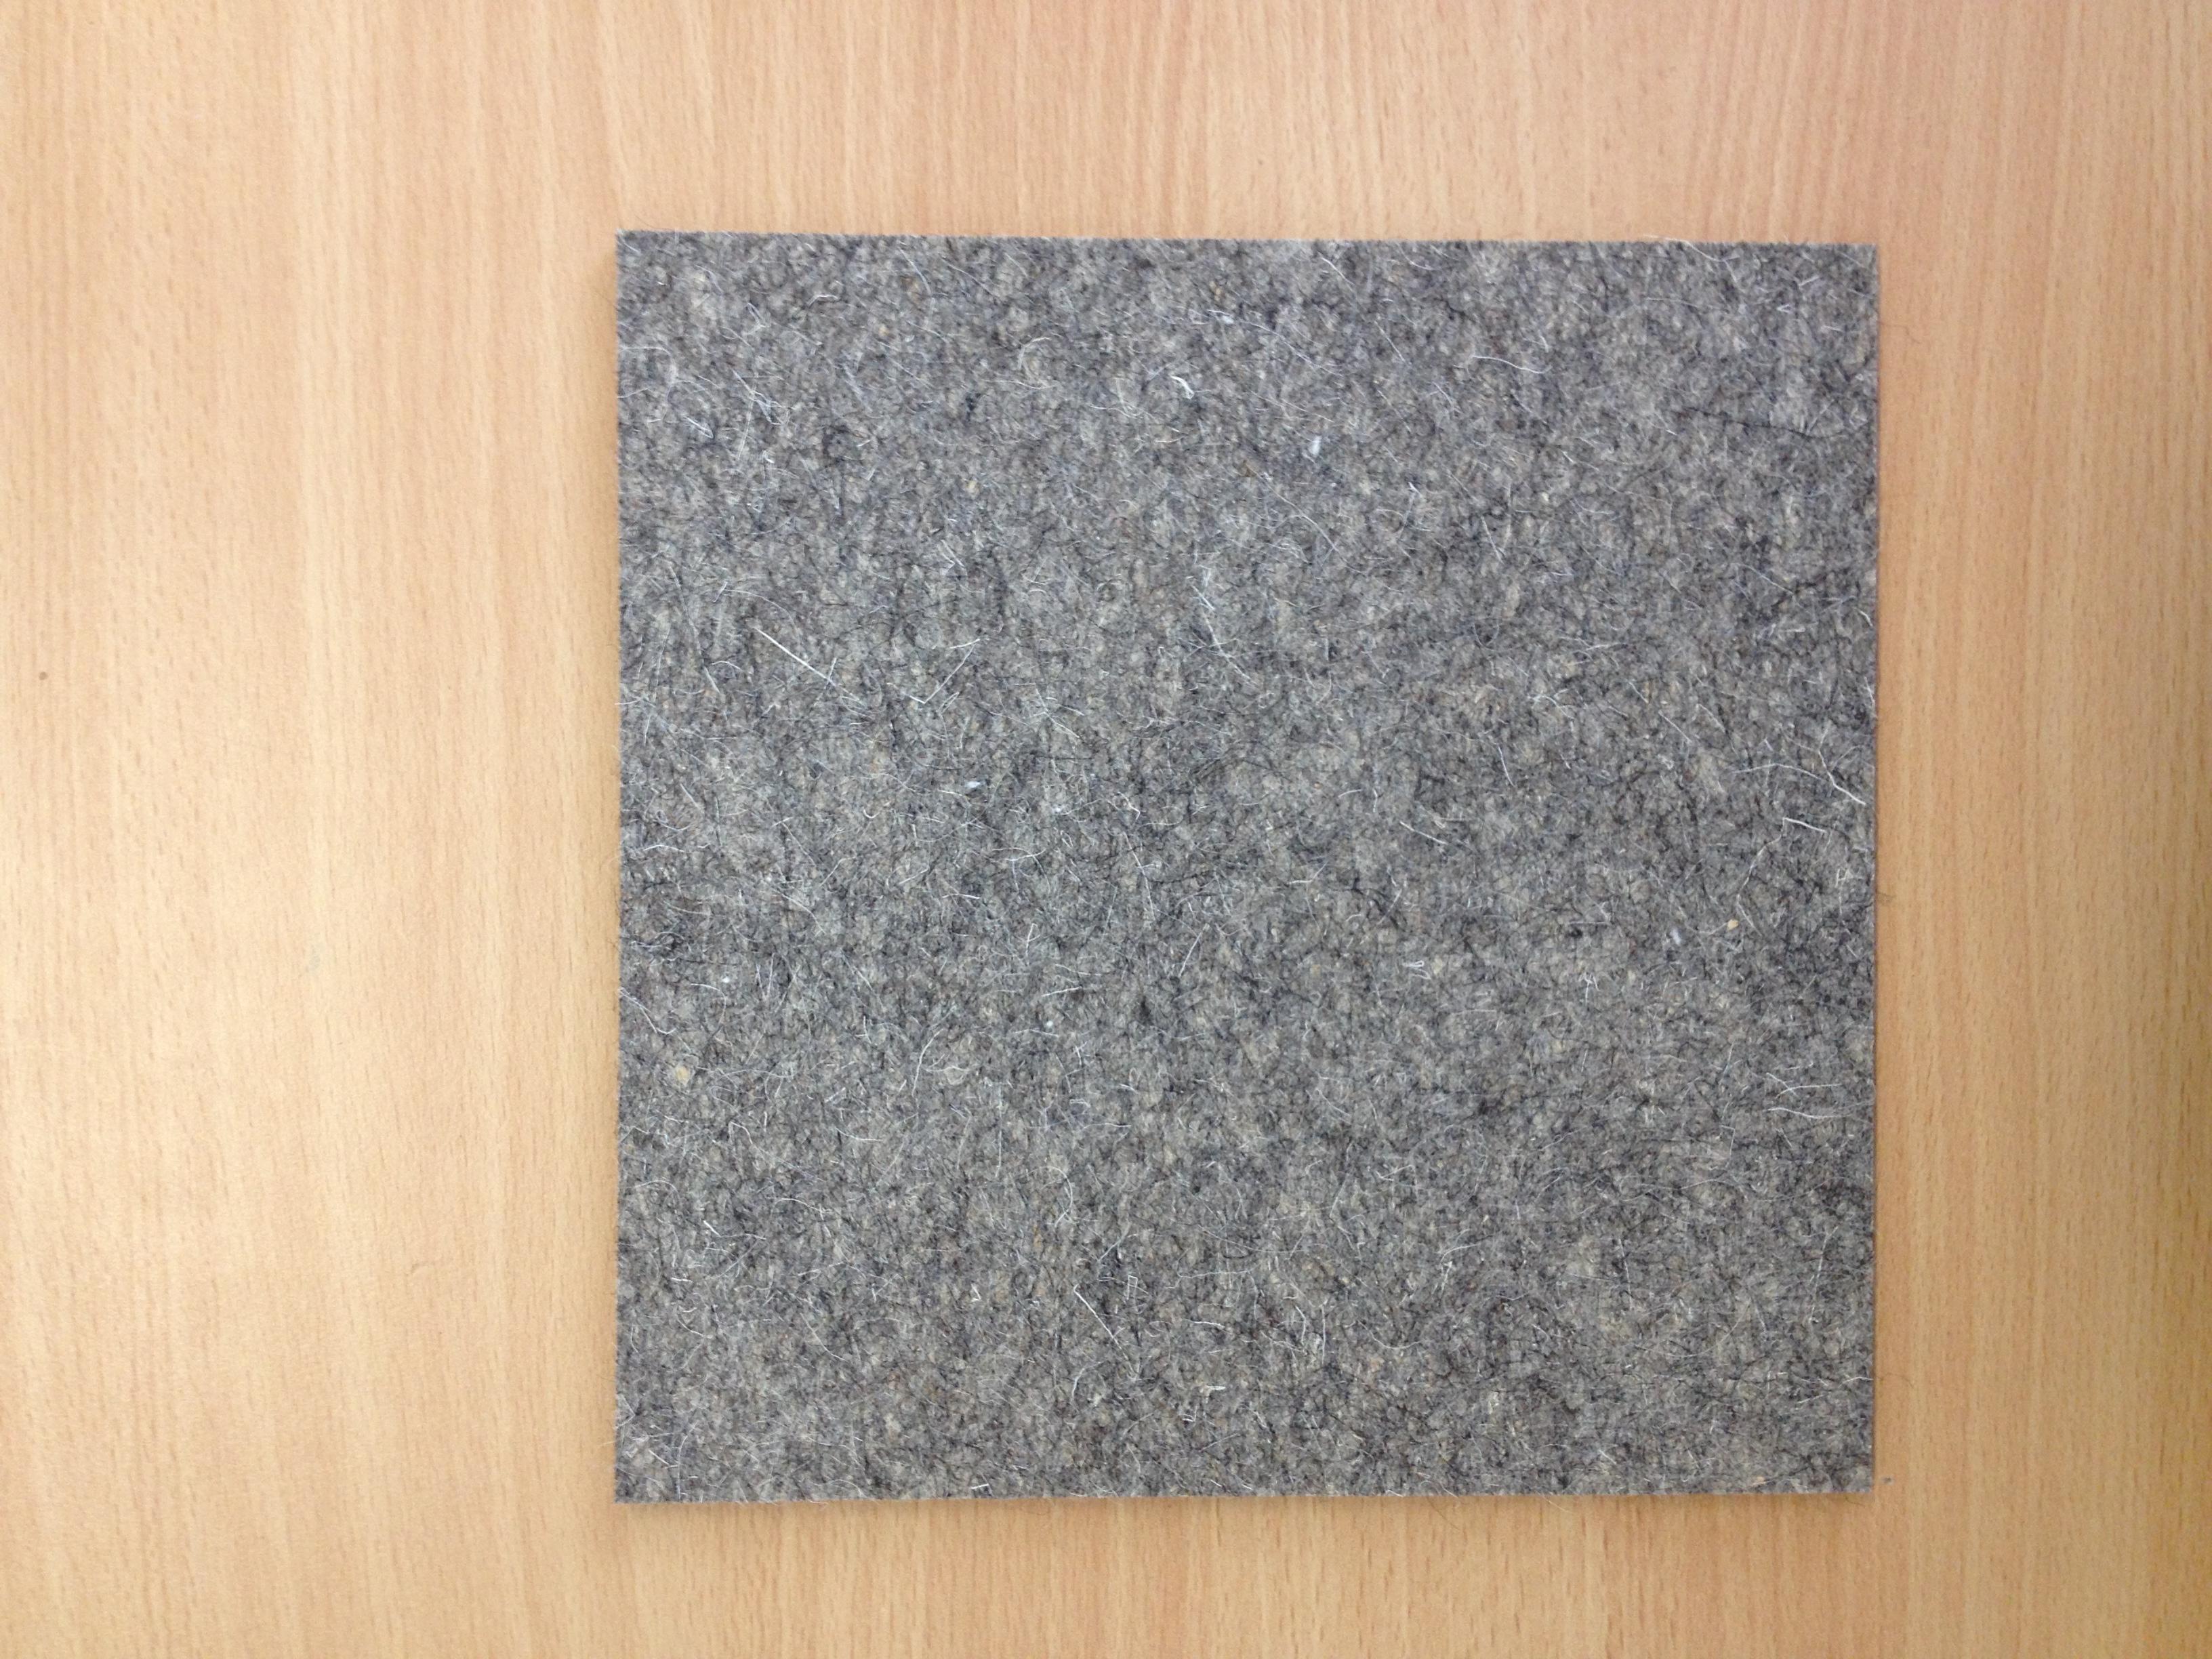 Selbstklebender Filzzuschnitt Aus 8 Mm Dickem Wollfilz Grau